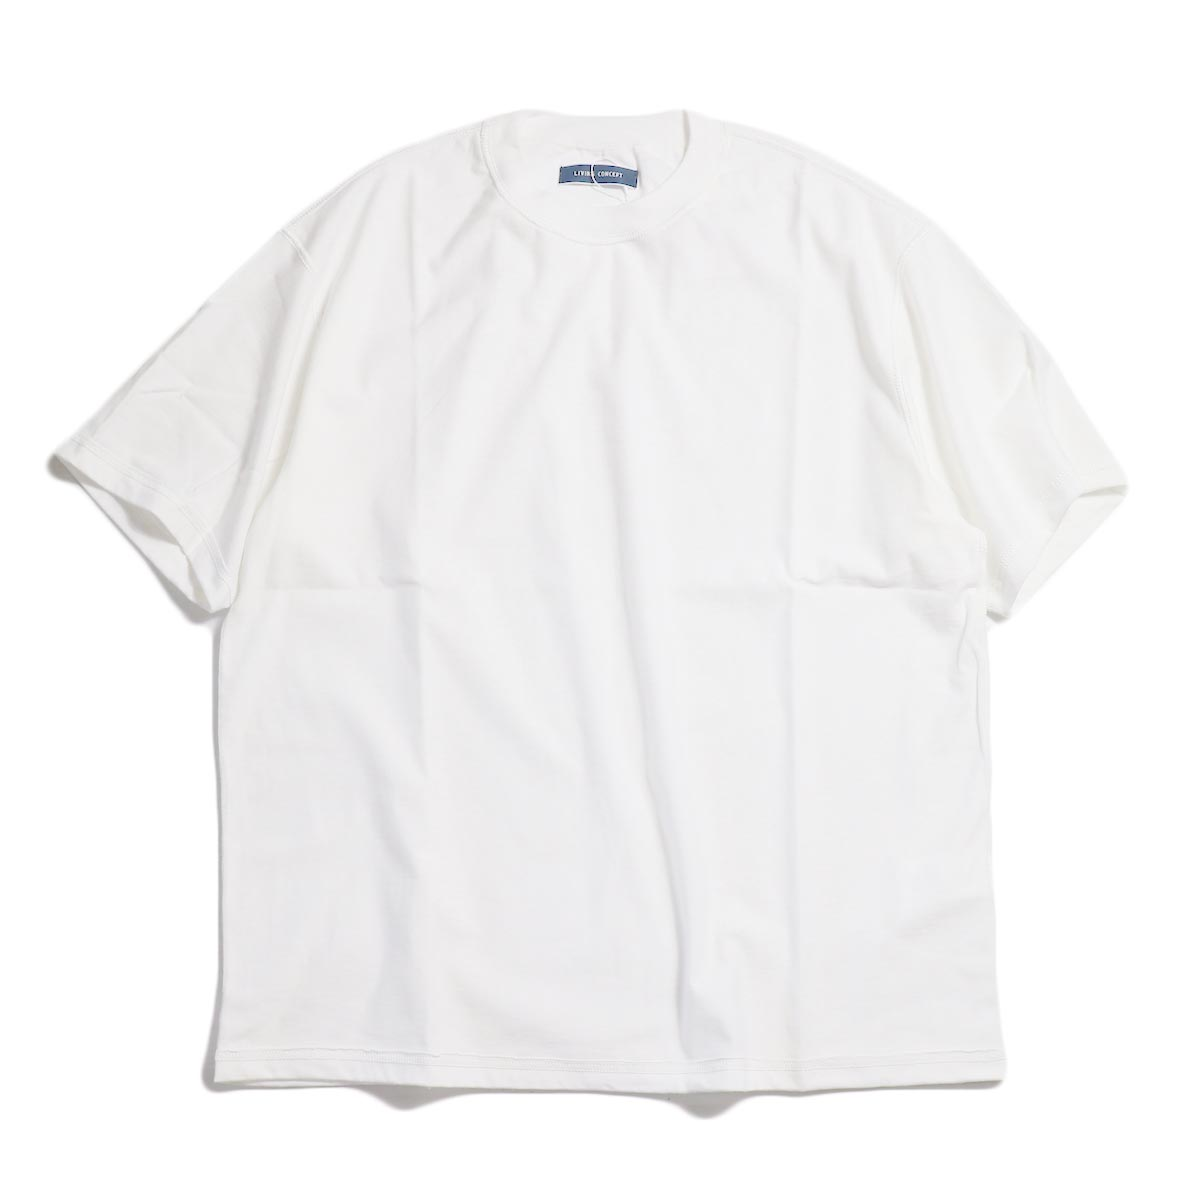 LIVING CONCEPT / INSIDEOUT T-SHIRT -White